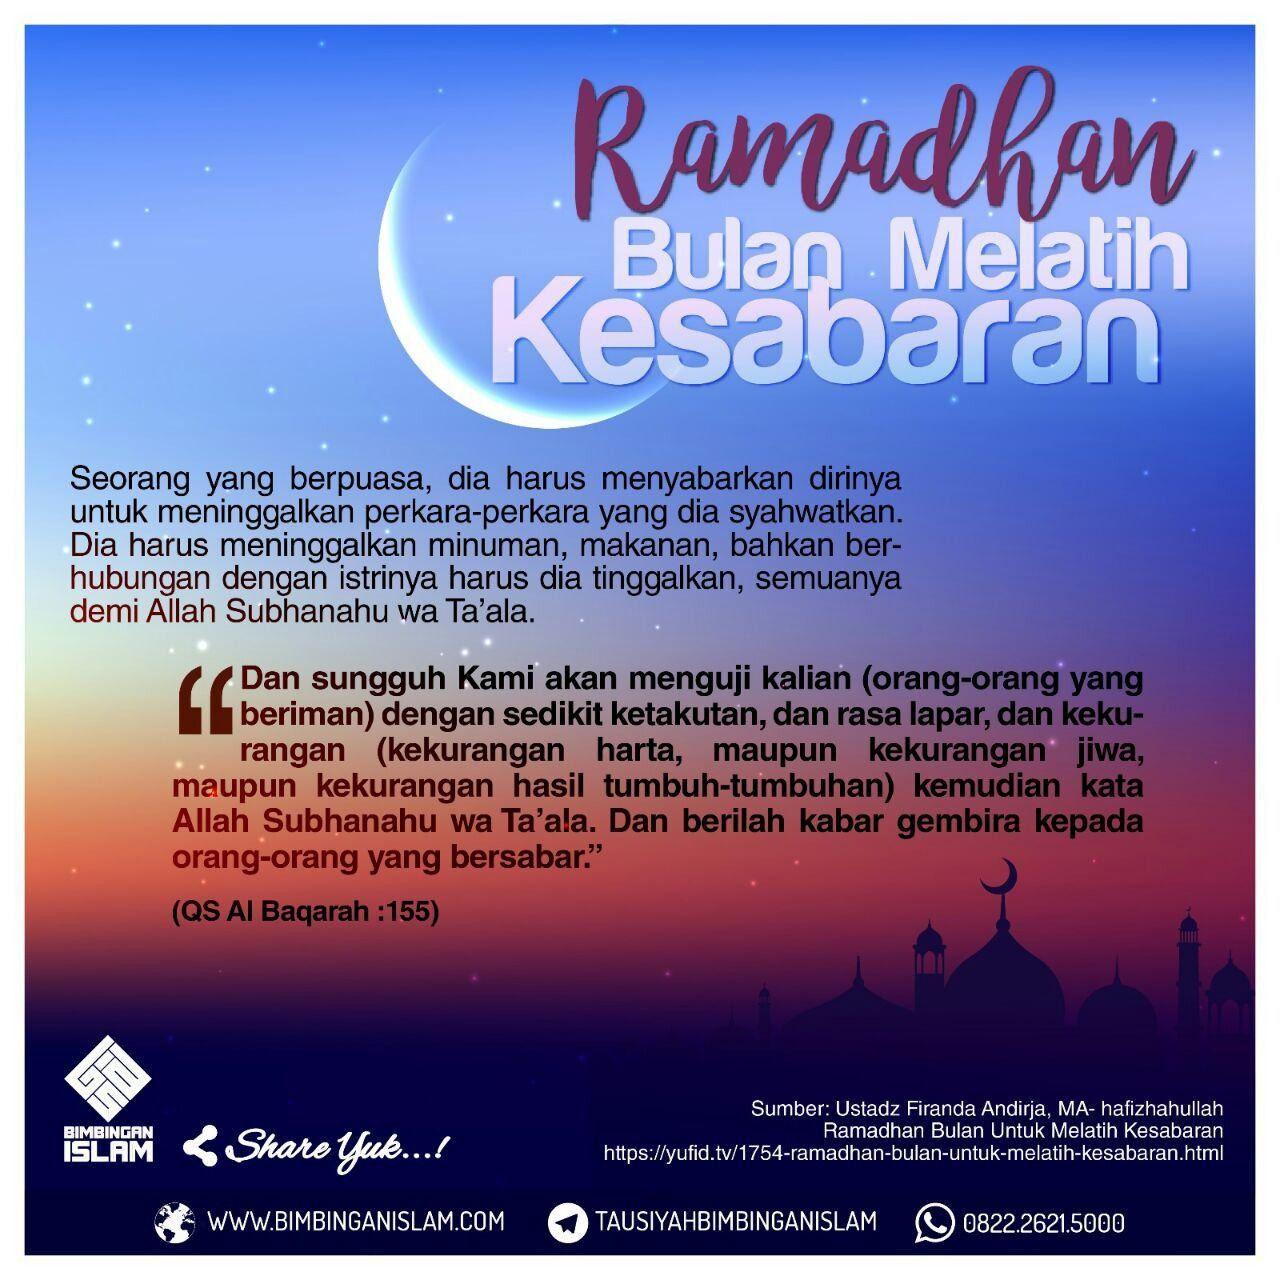 Gambar kata kata menyambut bulan ramadhan ahlu sunnah kata kata mutiara ramadhan quotes dan quotes